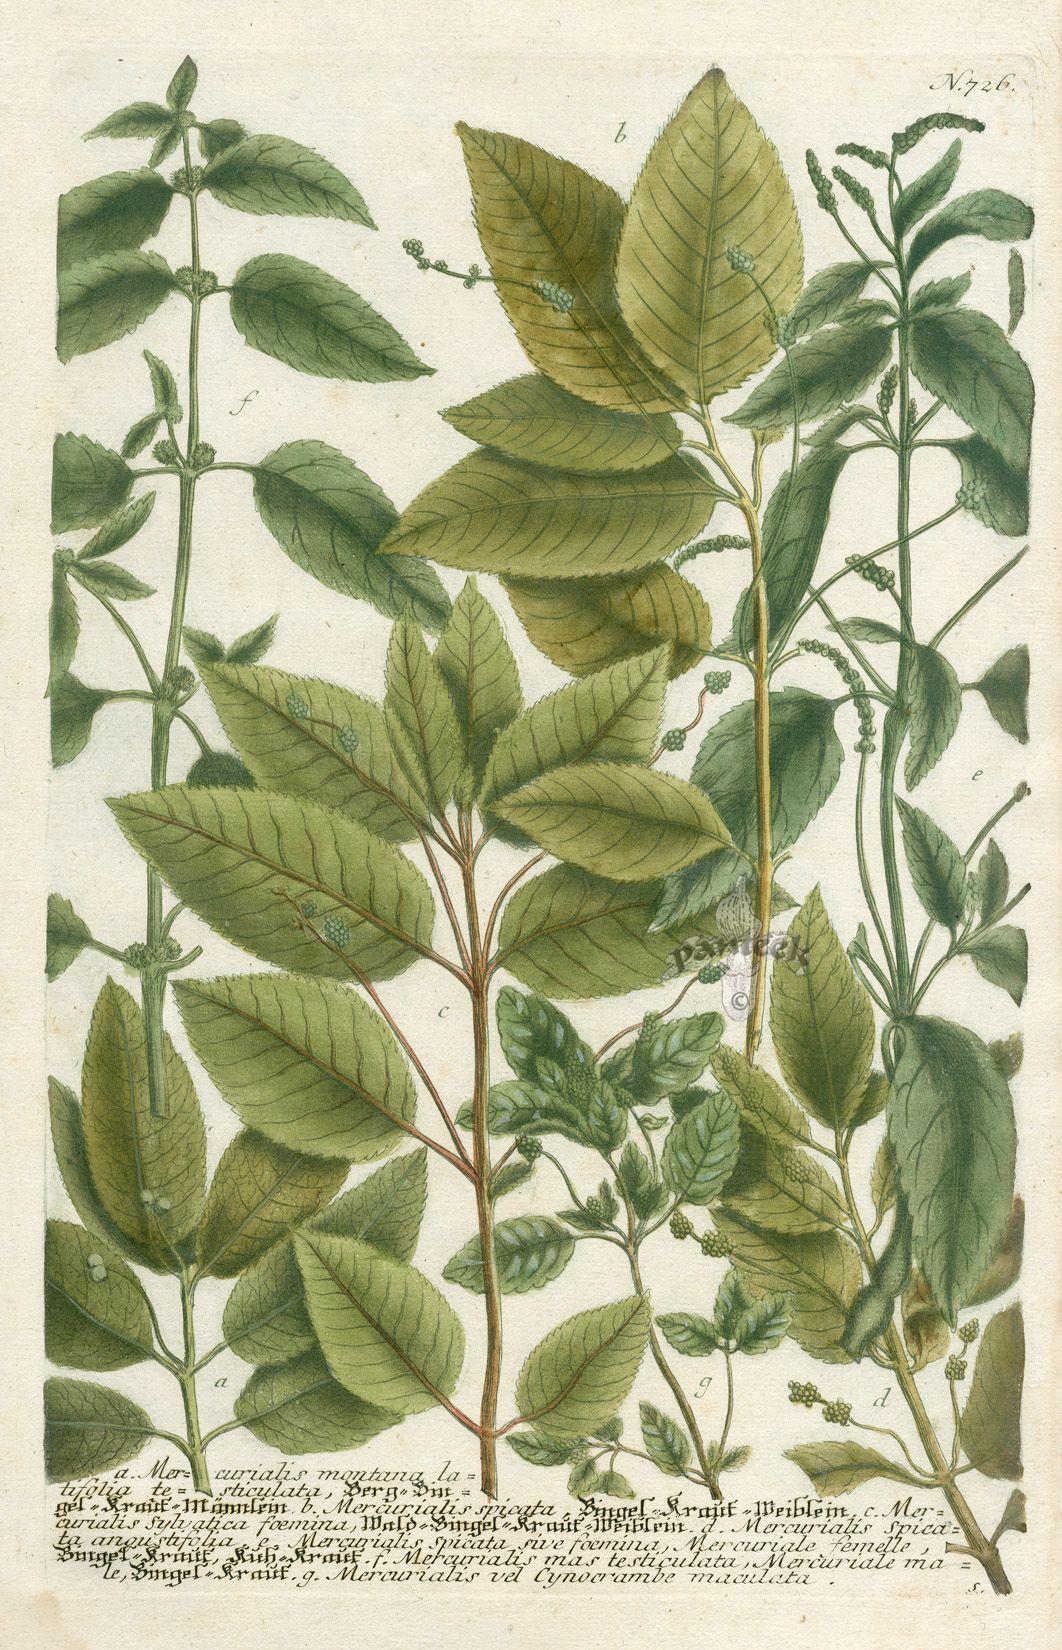 Mercurialis montana latifolia testiculata (1062×1650)